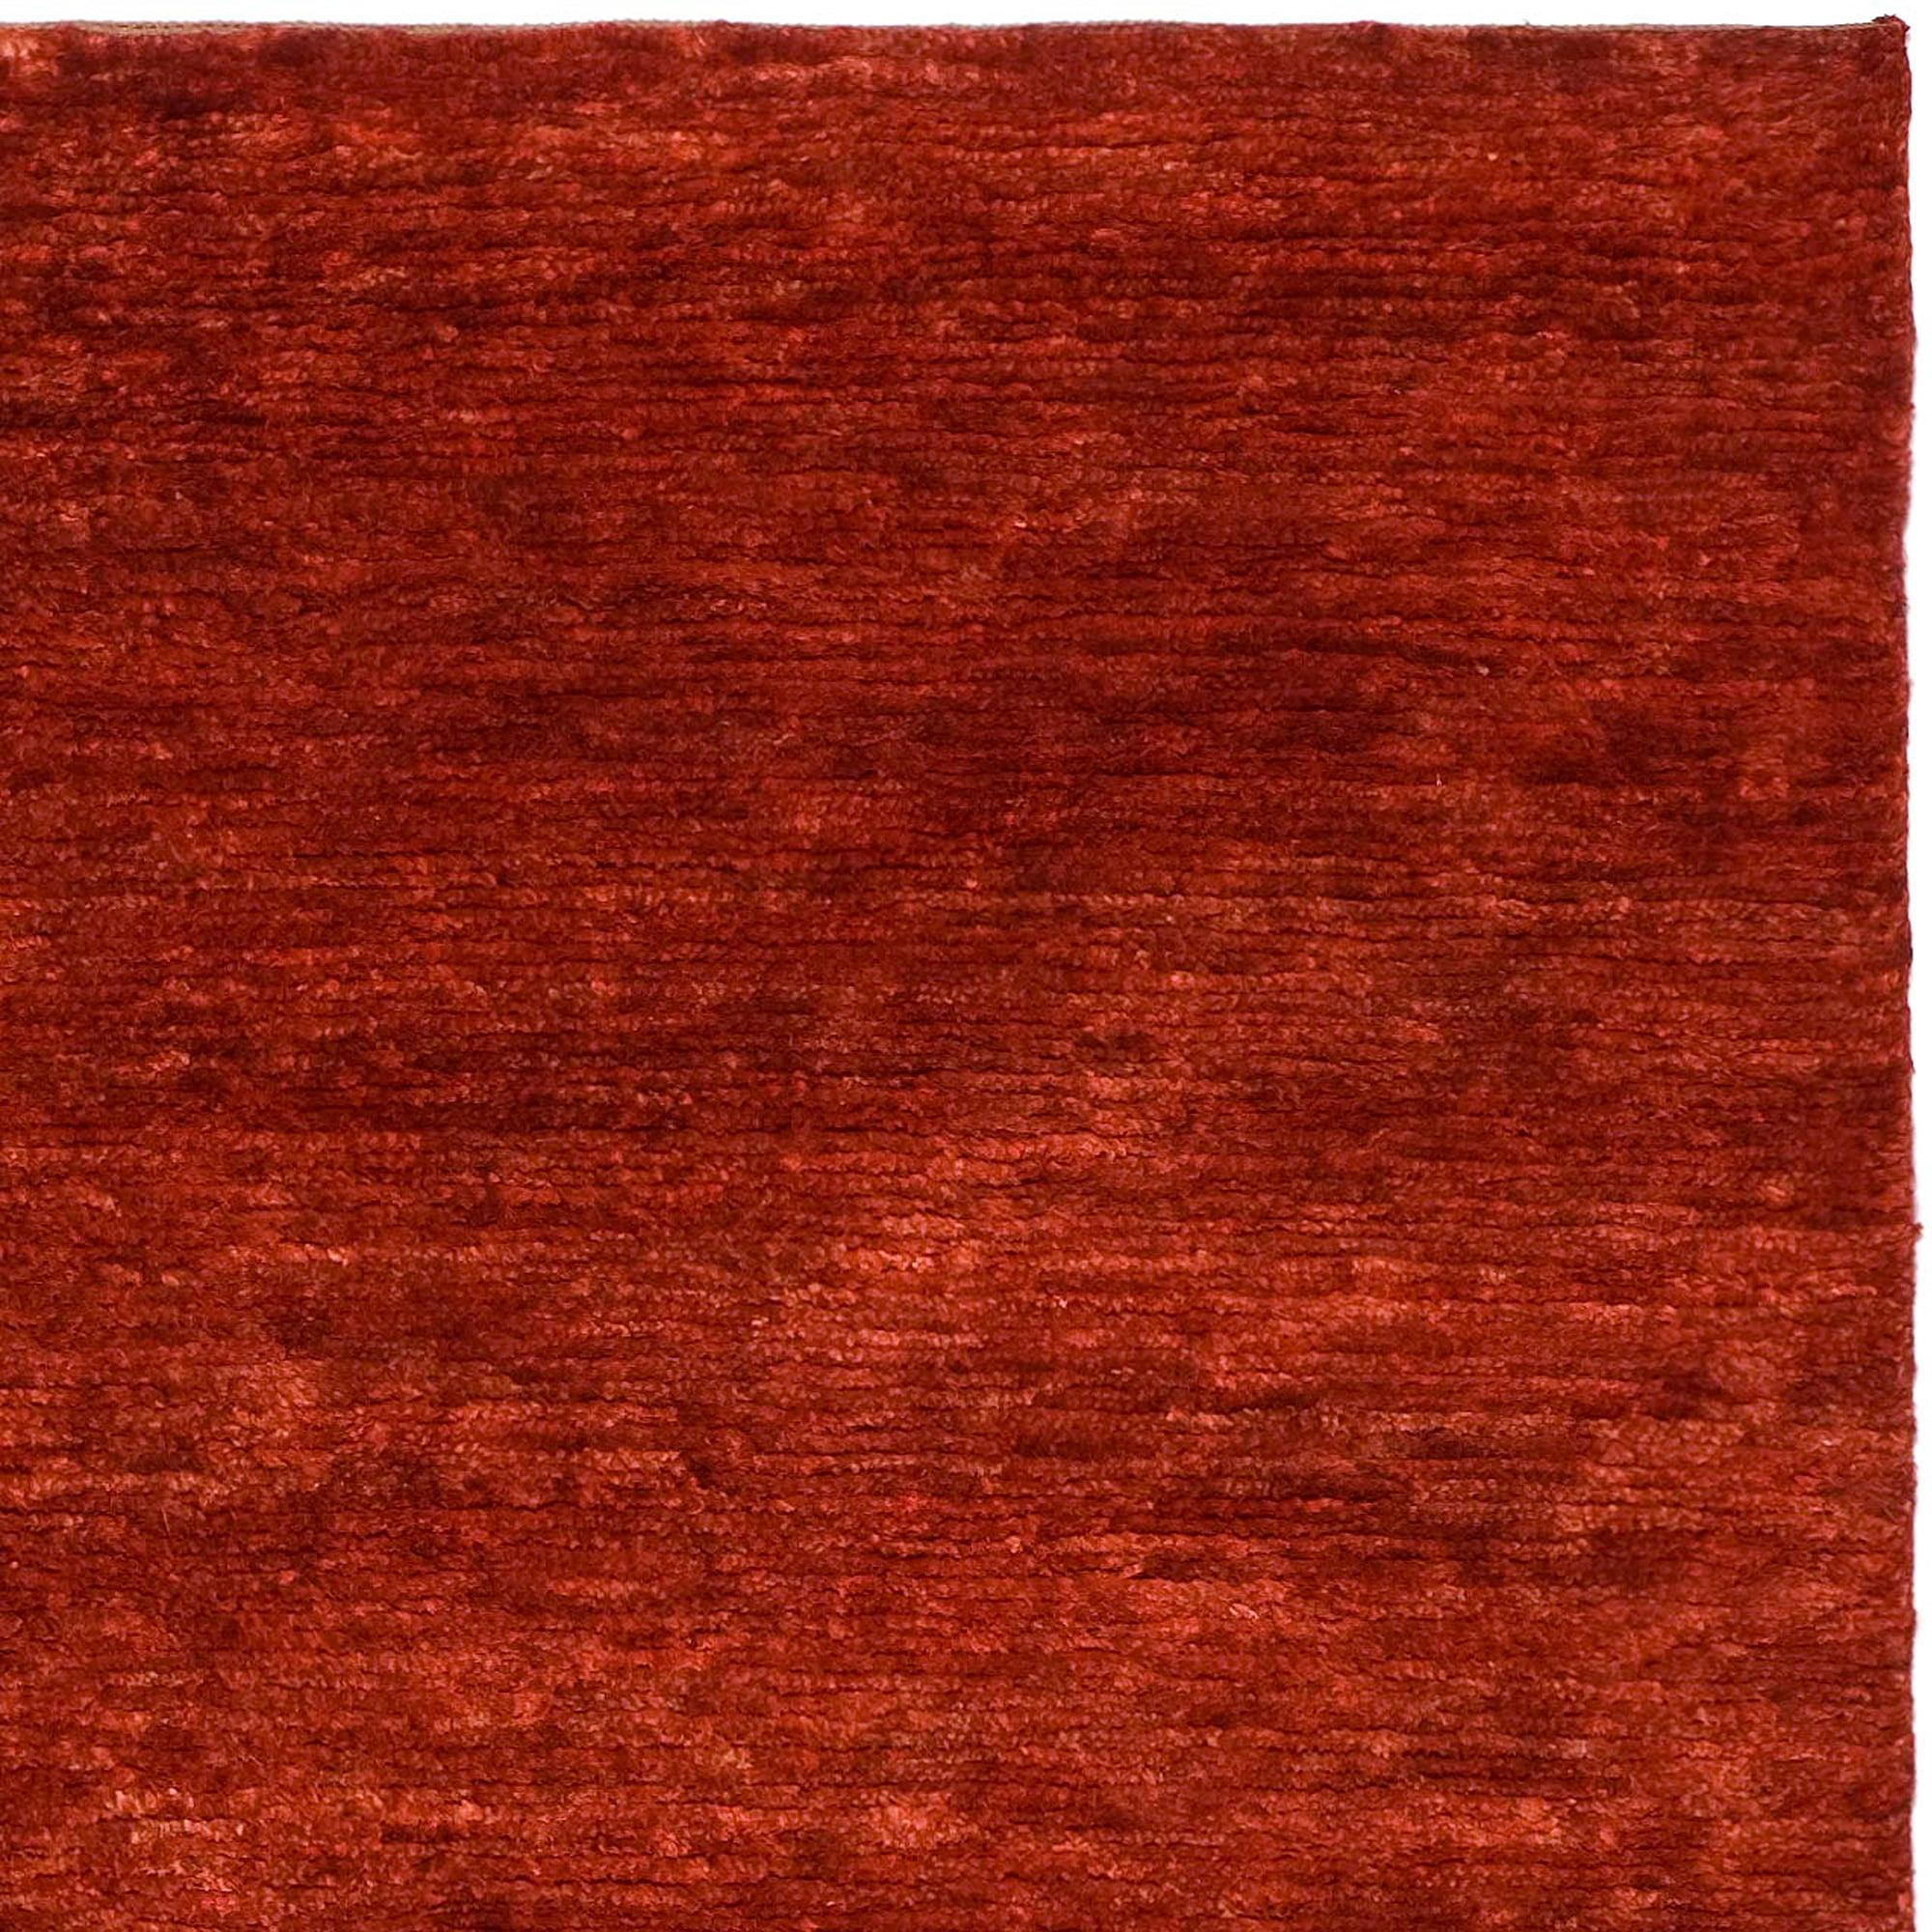 Safavieh Bohemian Paul Hand-Tufted Hemp Area Rug